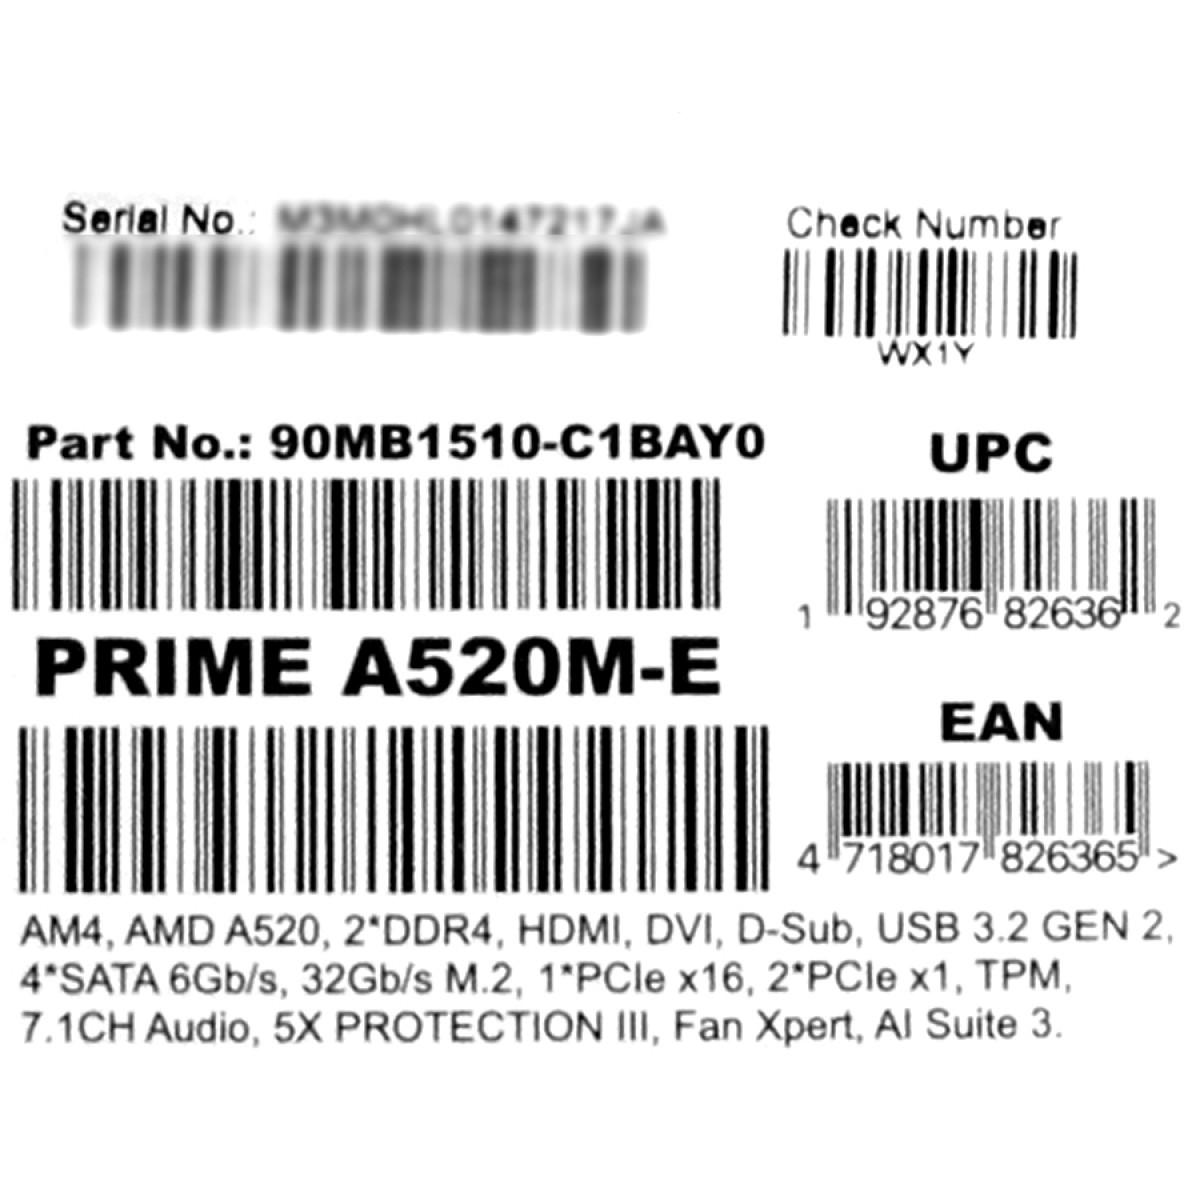 Placa Mãe Asus Prime A520M-E, Chipset A520, AMD AM4, mATX, DDR4, 90MB1510-C1BAY0